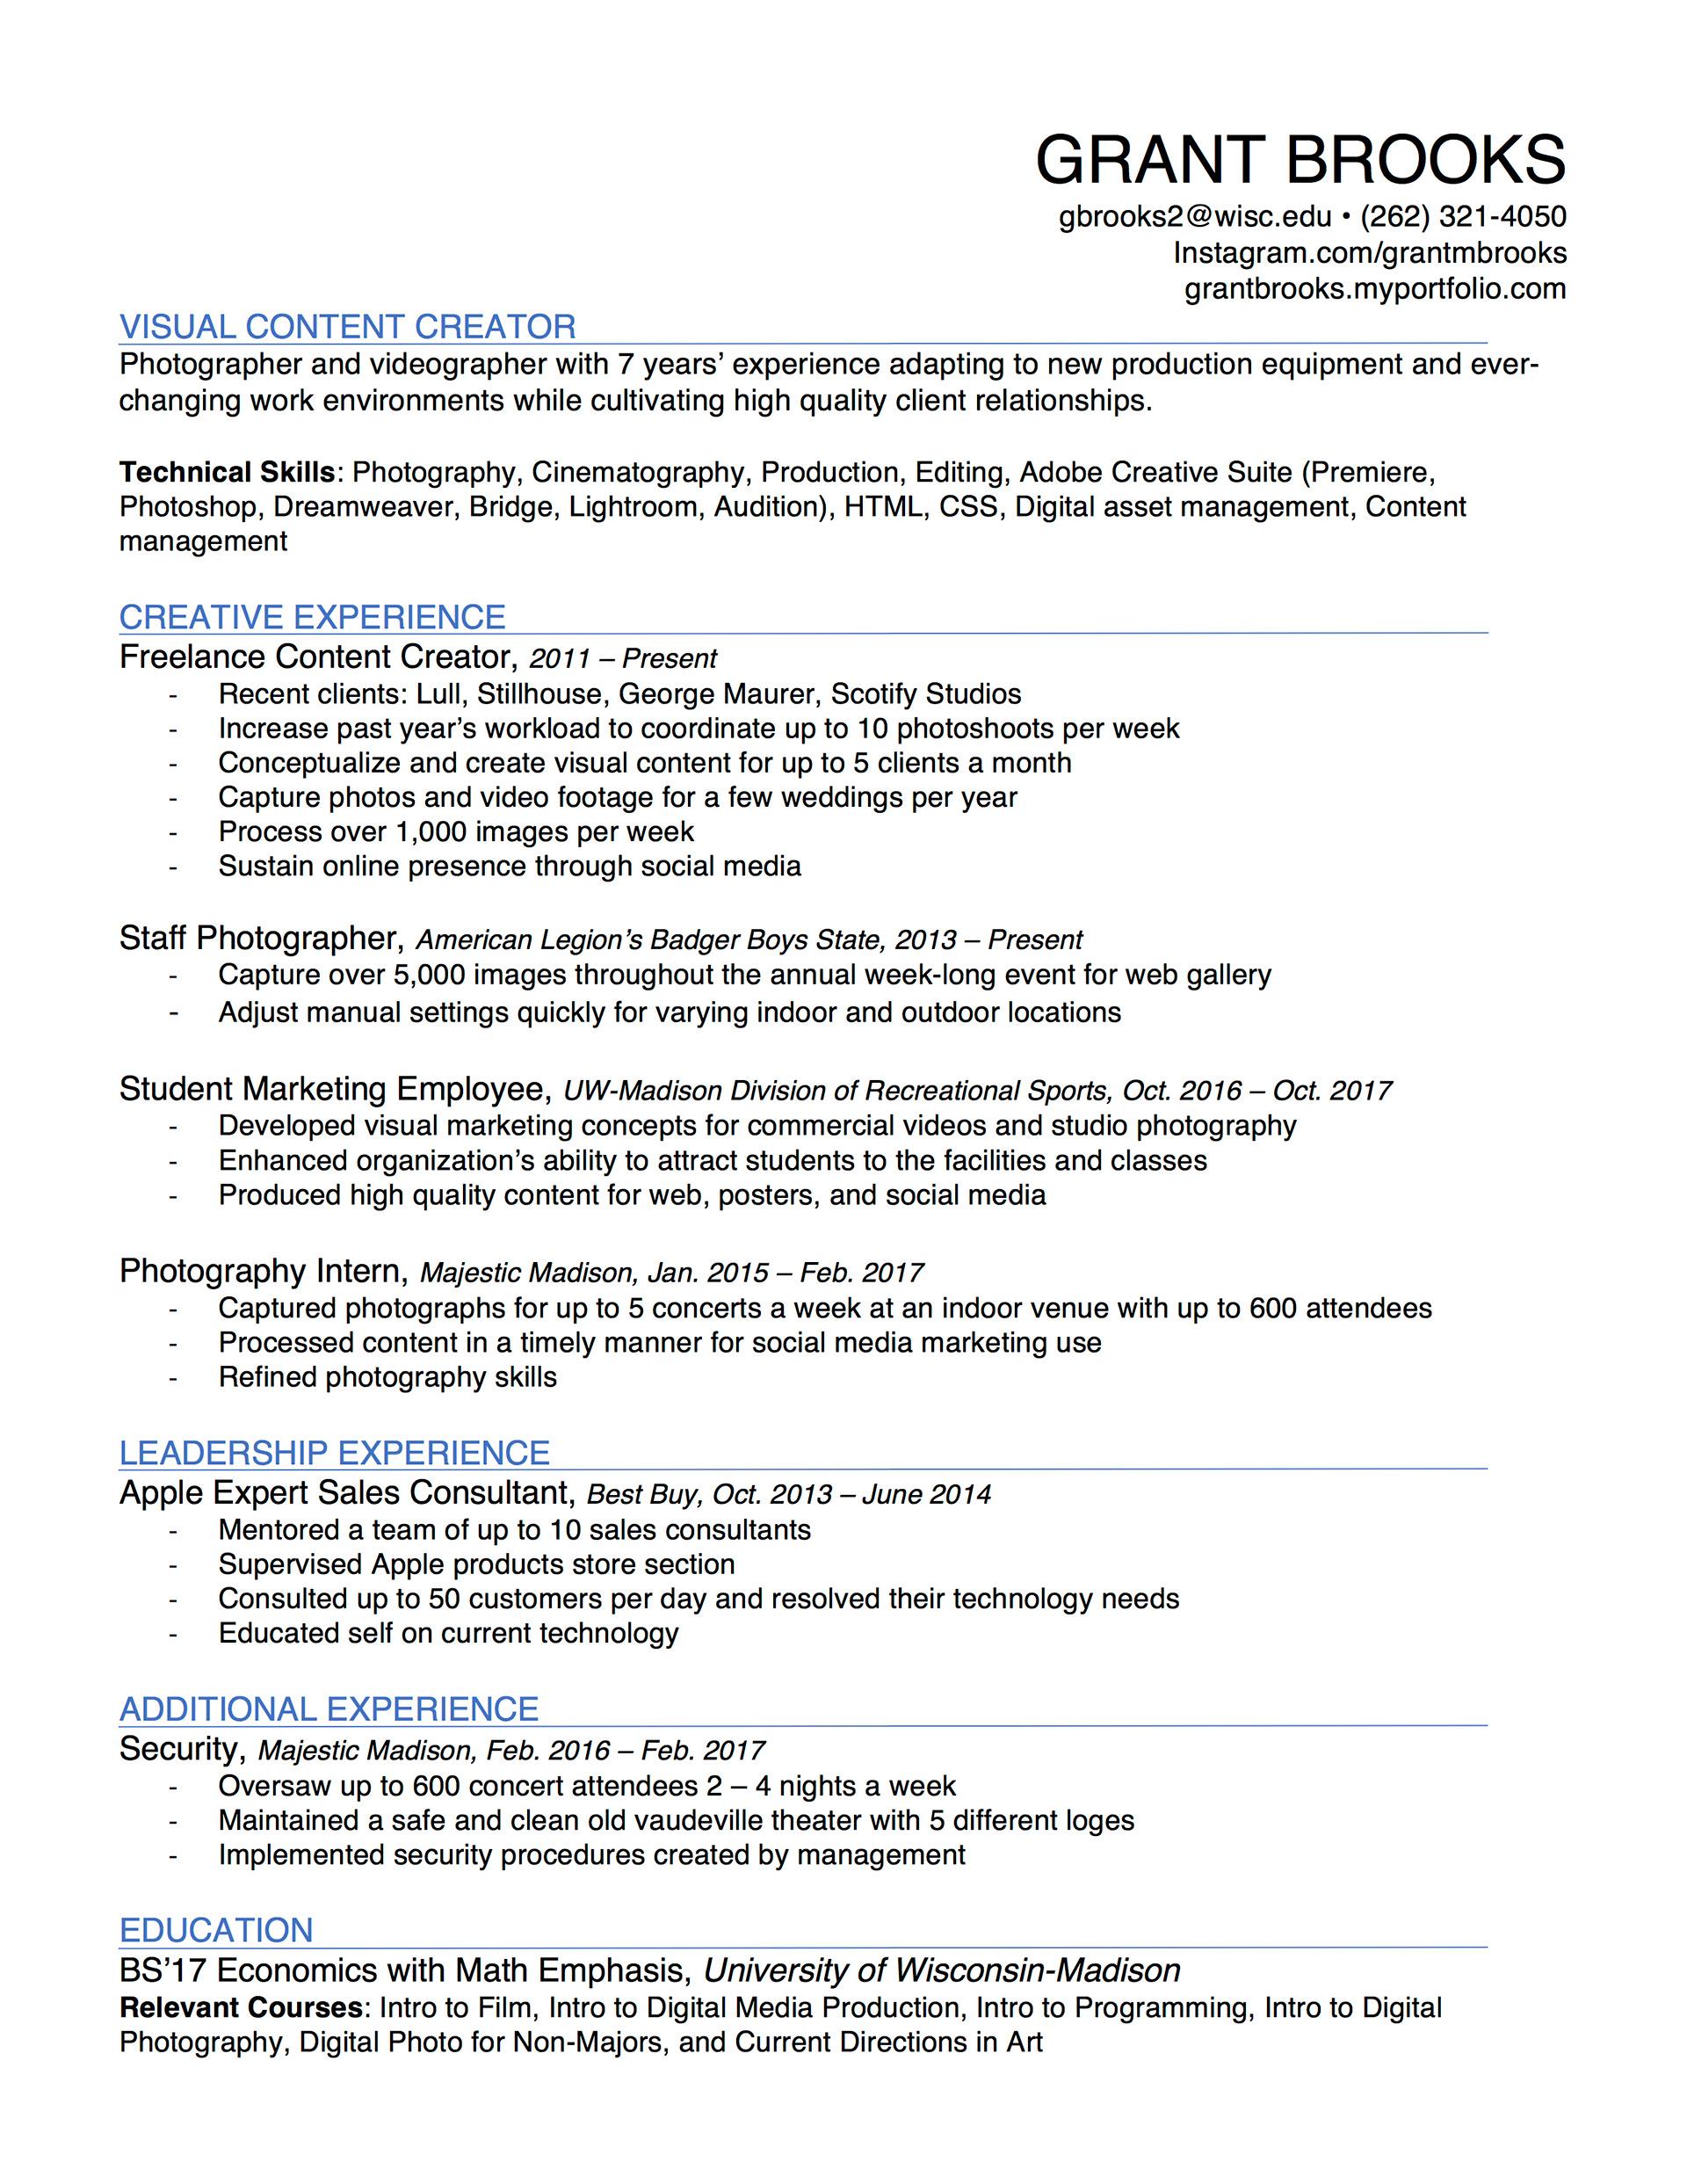 Grant Brooks - Resume